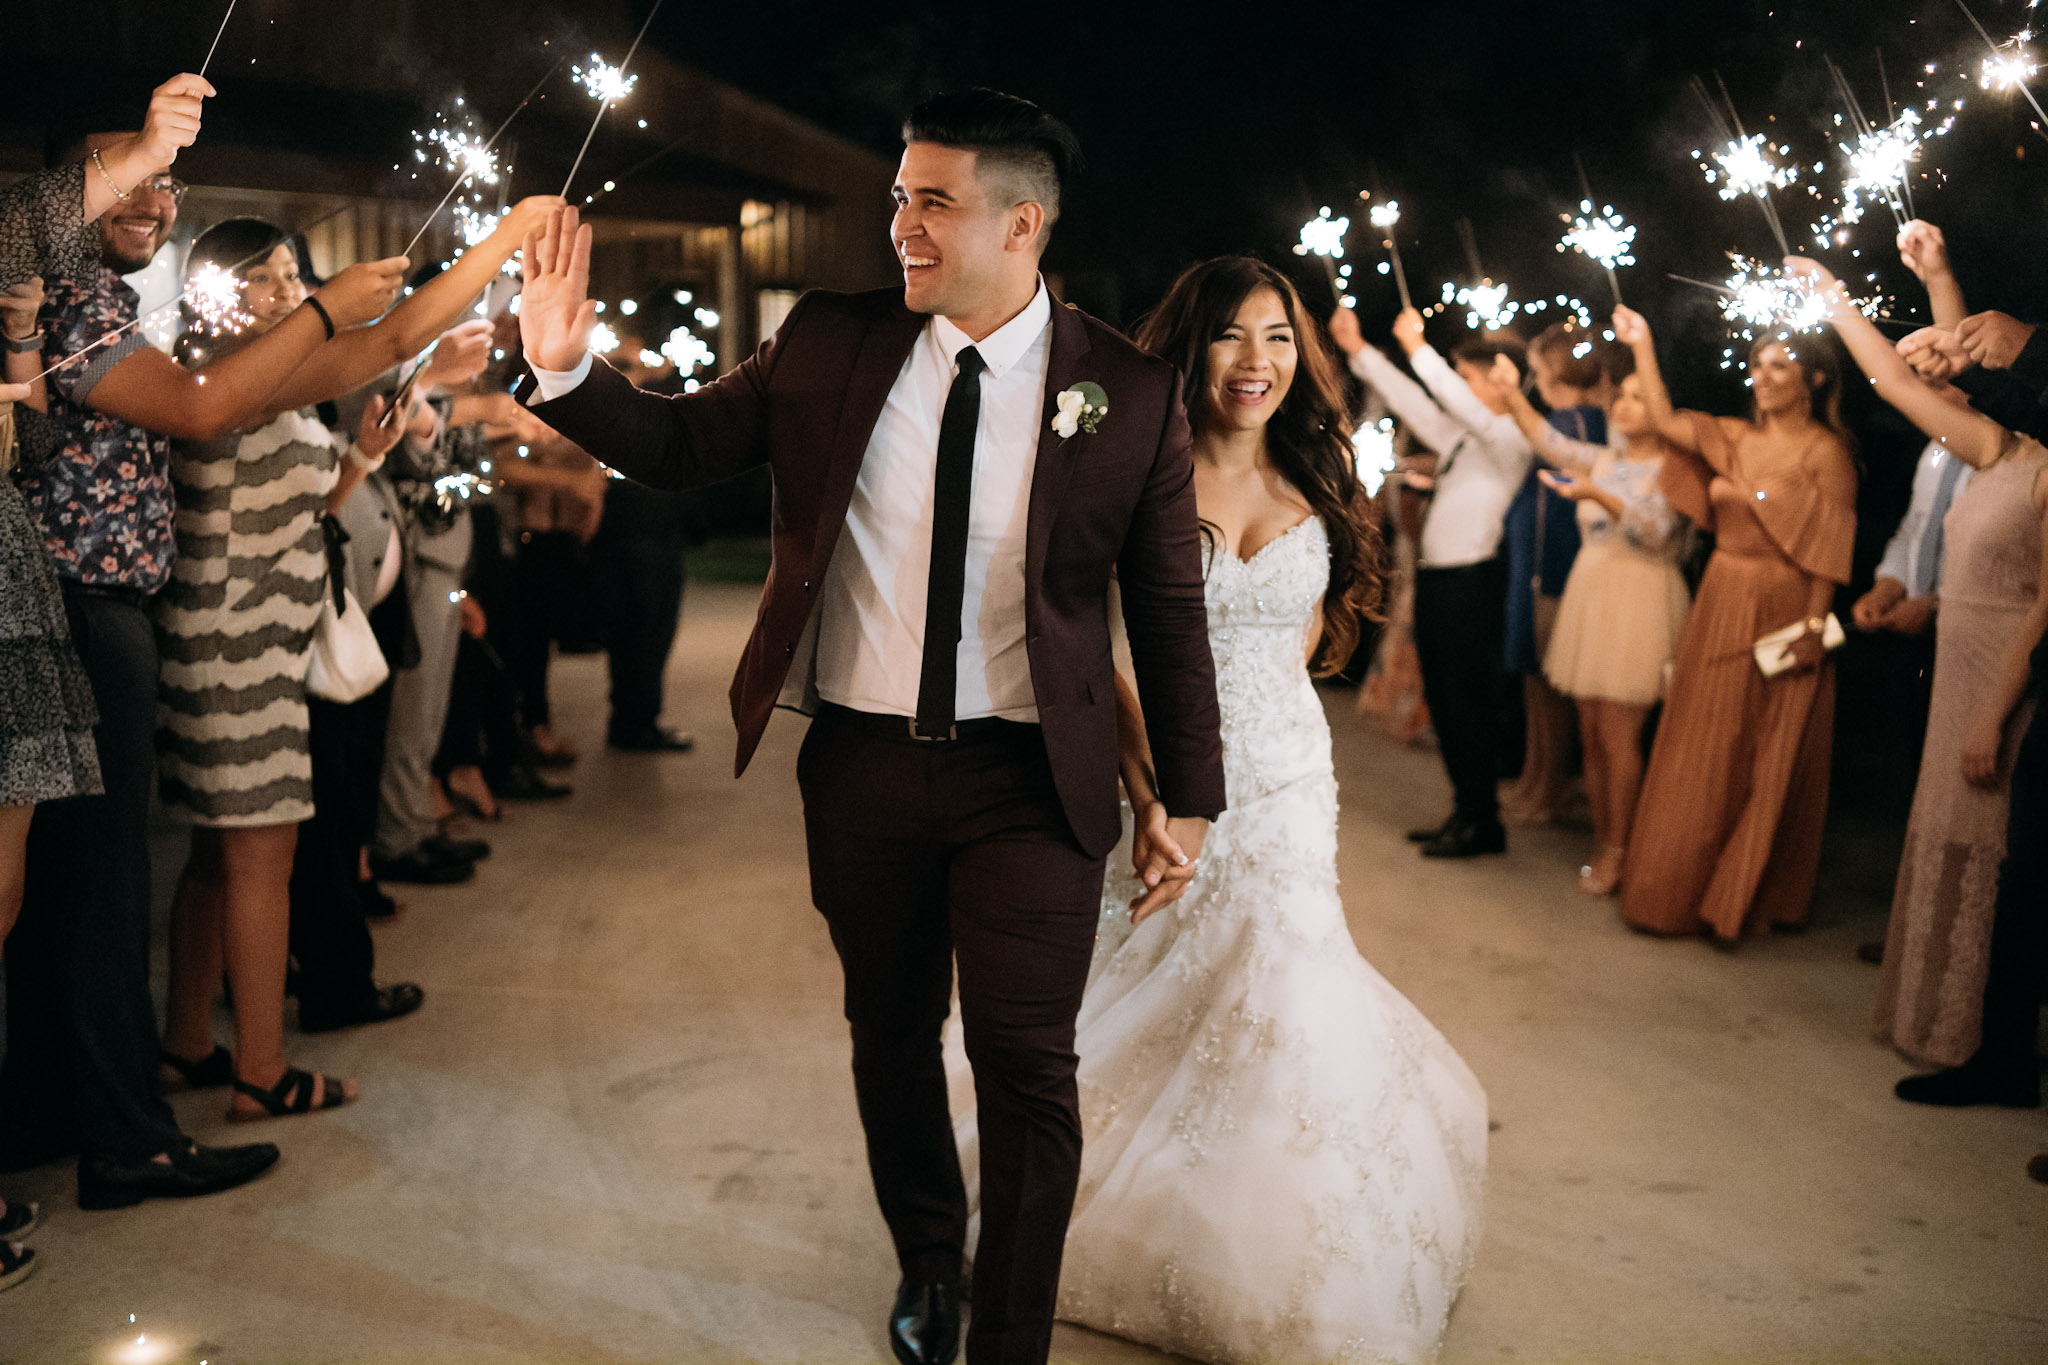 060718-A-JoeDel-Wedding-AdrianRGarcia-FOMAScine_AA99870.jpg